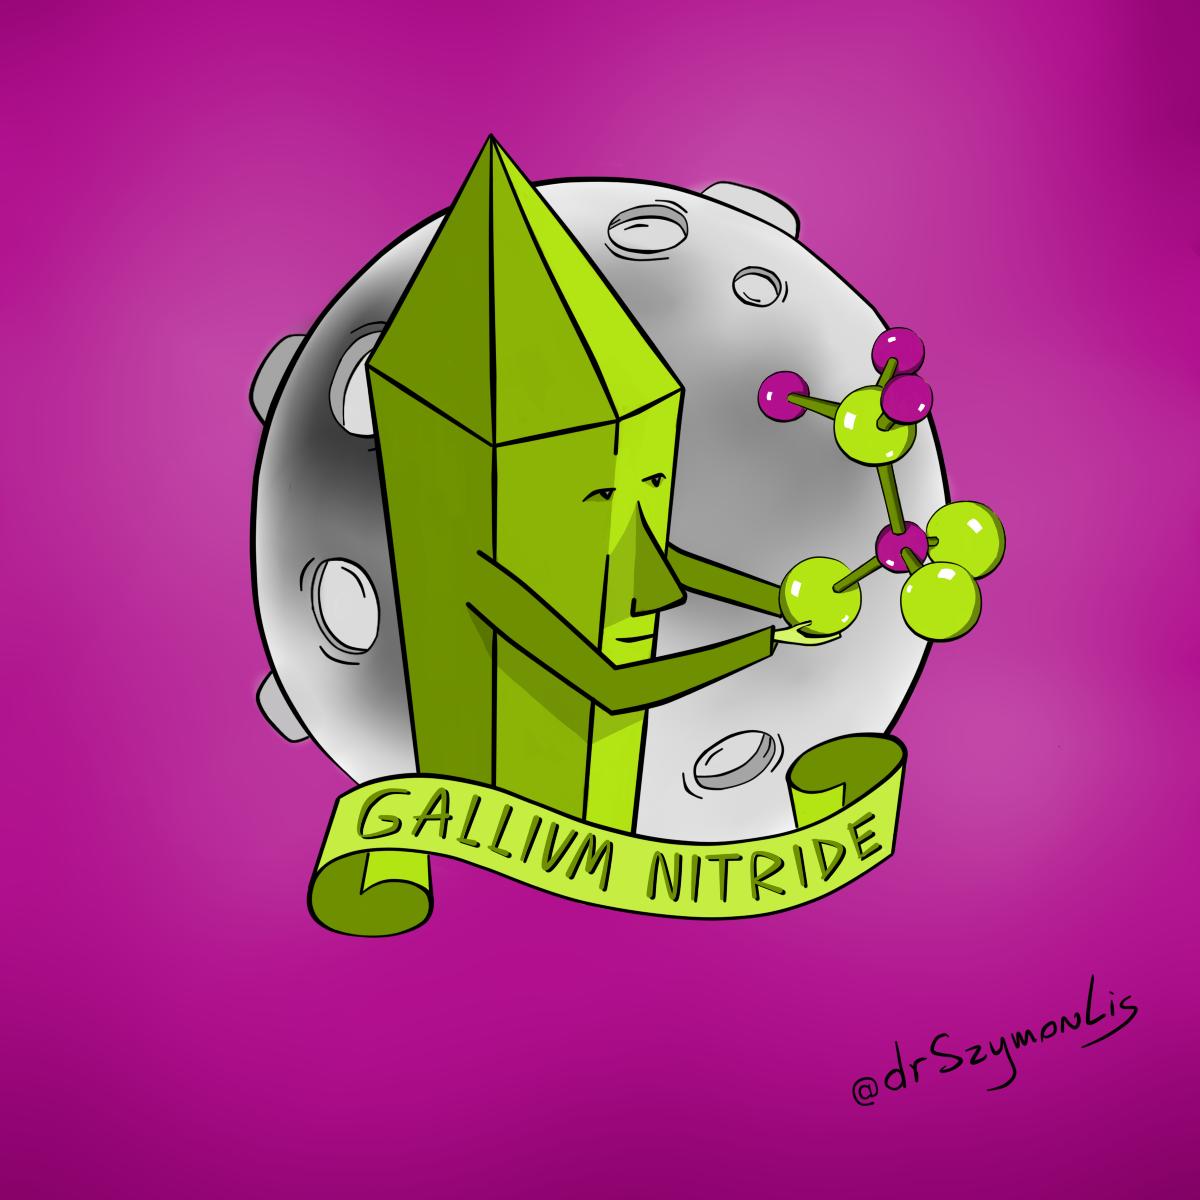 GalliumNitrideSq